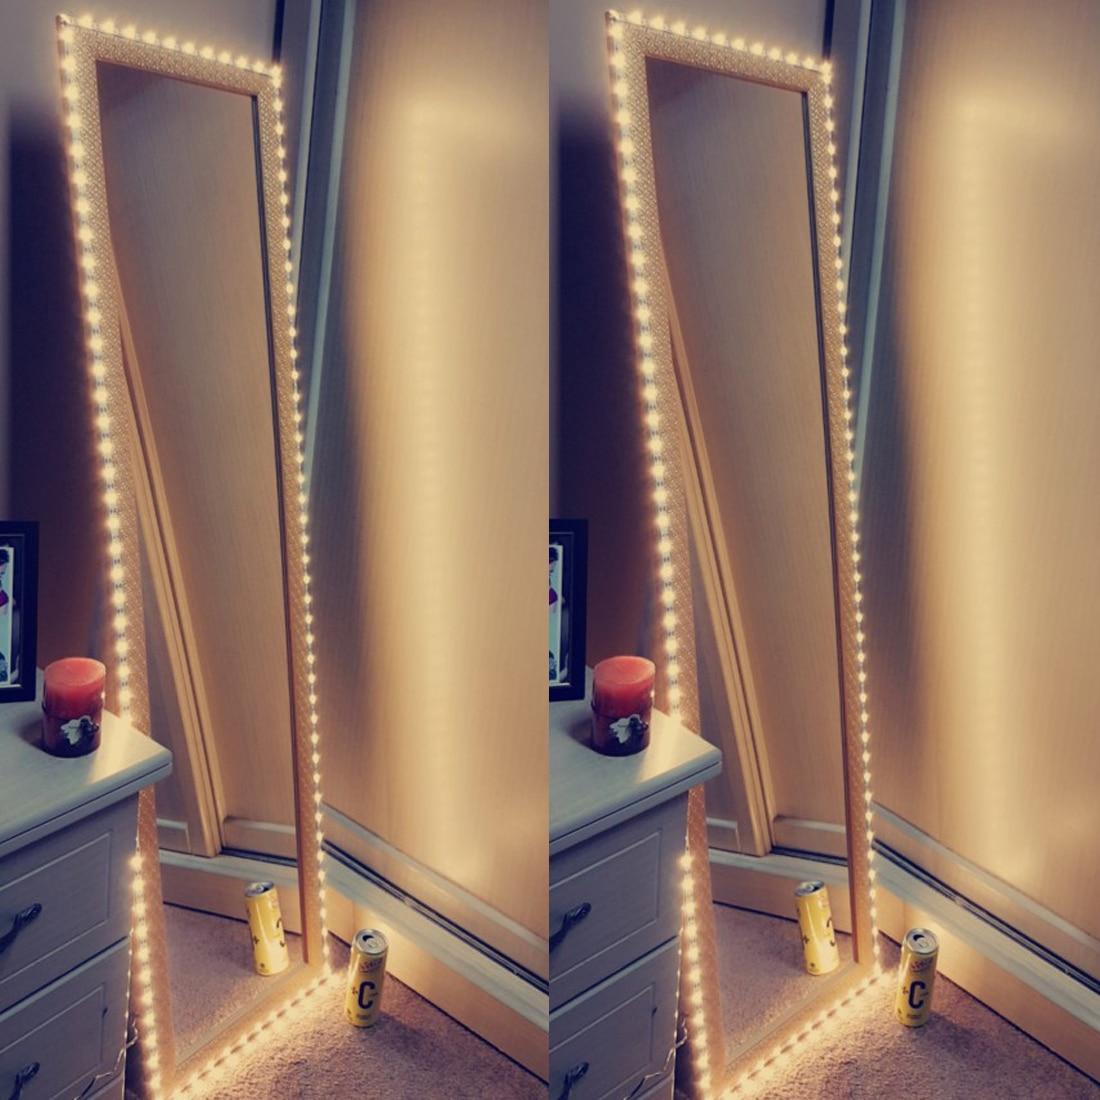 Eitelkeit Make-Up-Spiegel Licht 5V USB LED Flexible Band USB Kabel Powered Dressing spiegel Lampe Decor